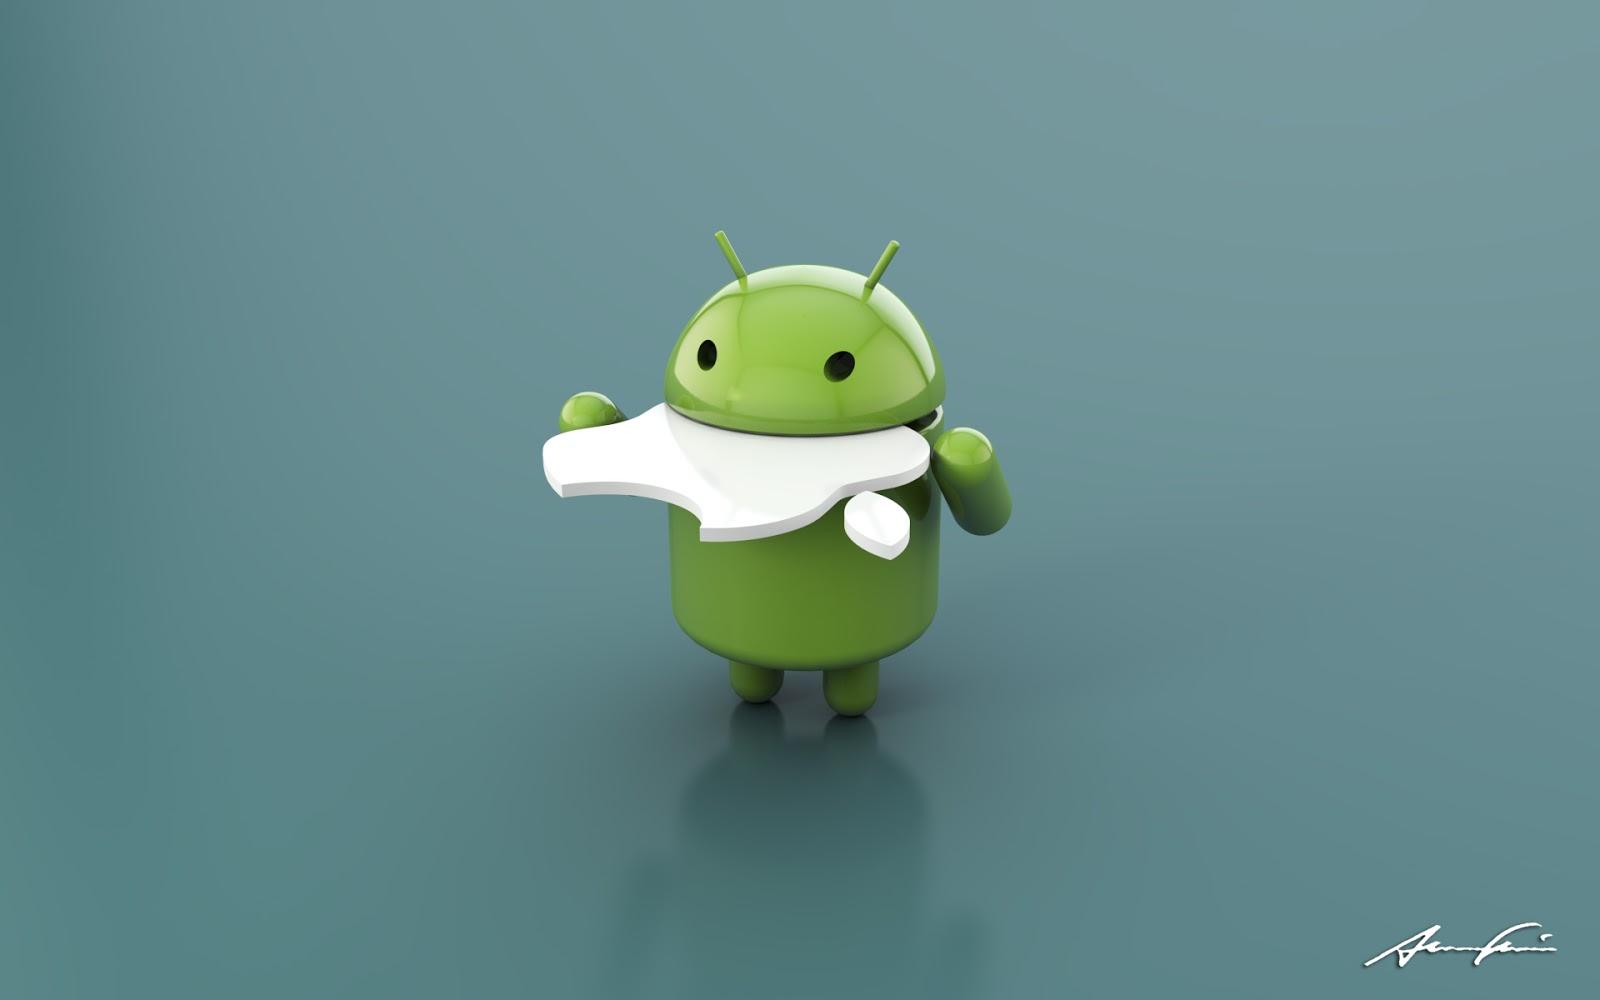 Android Wallpapers Hd: 1080p Wallpapers: Android Wallpapers HD